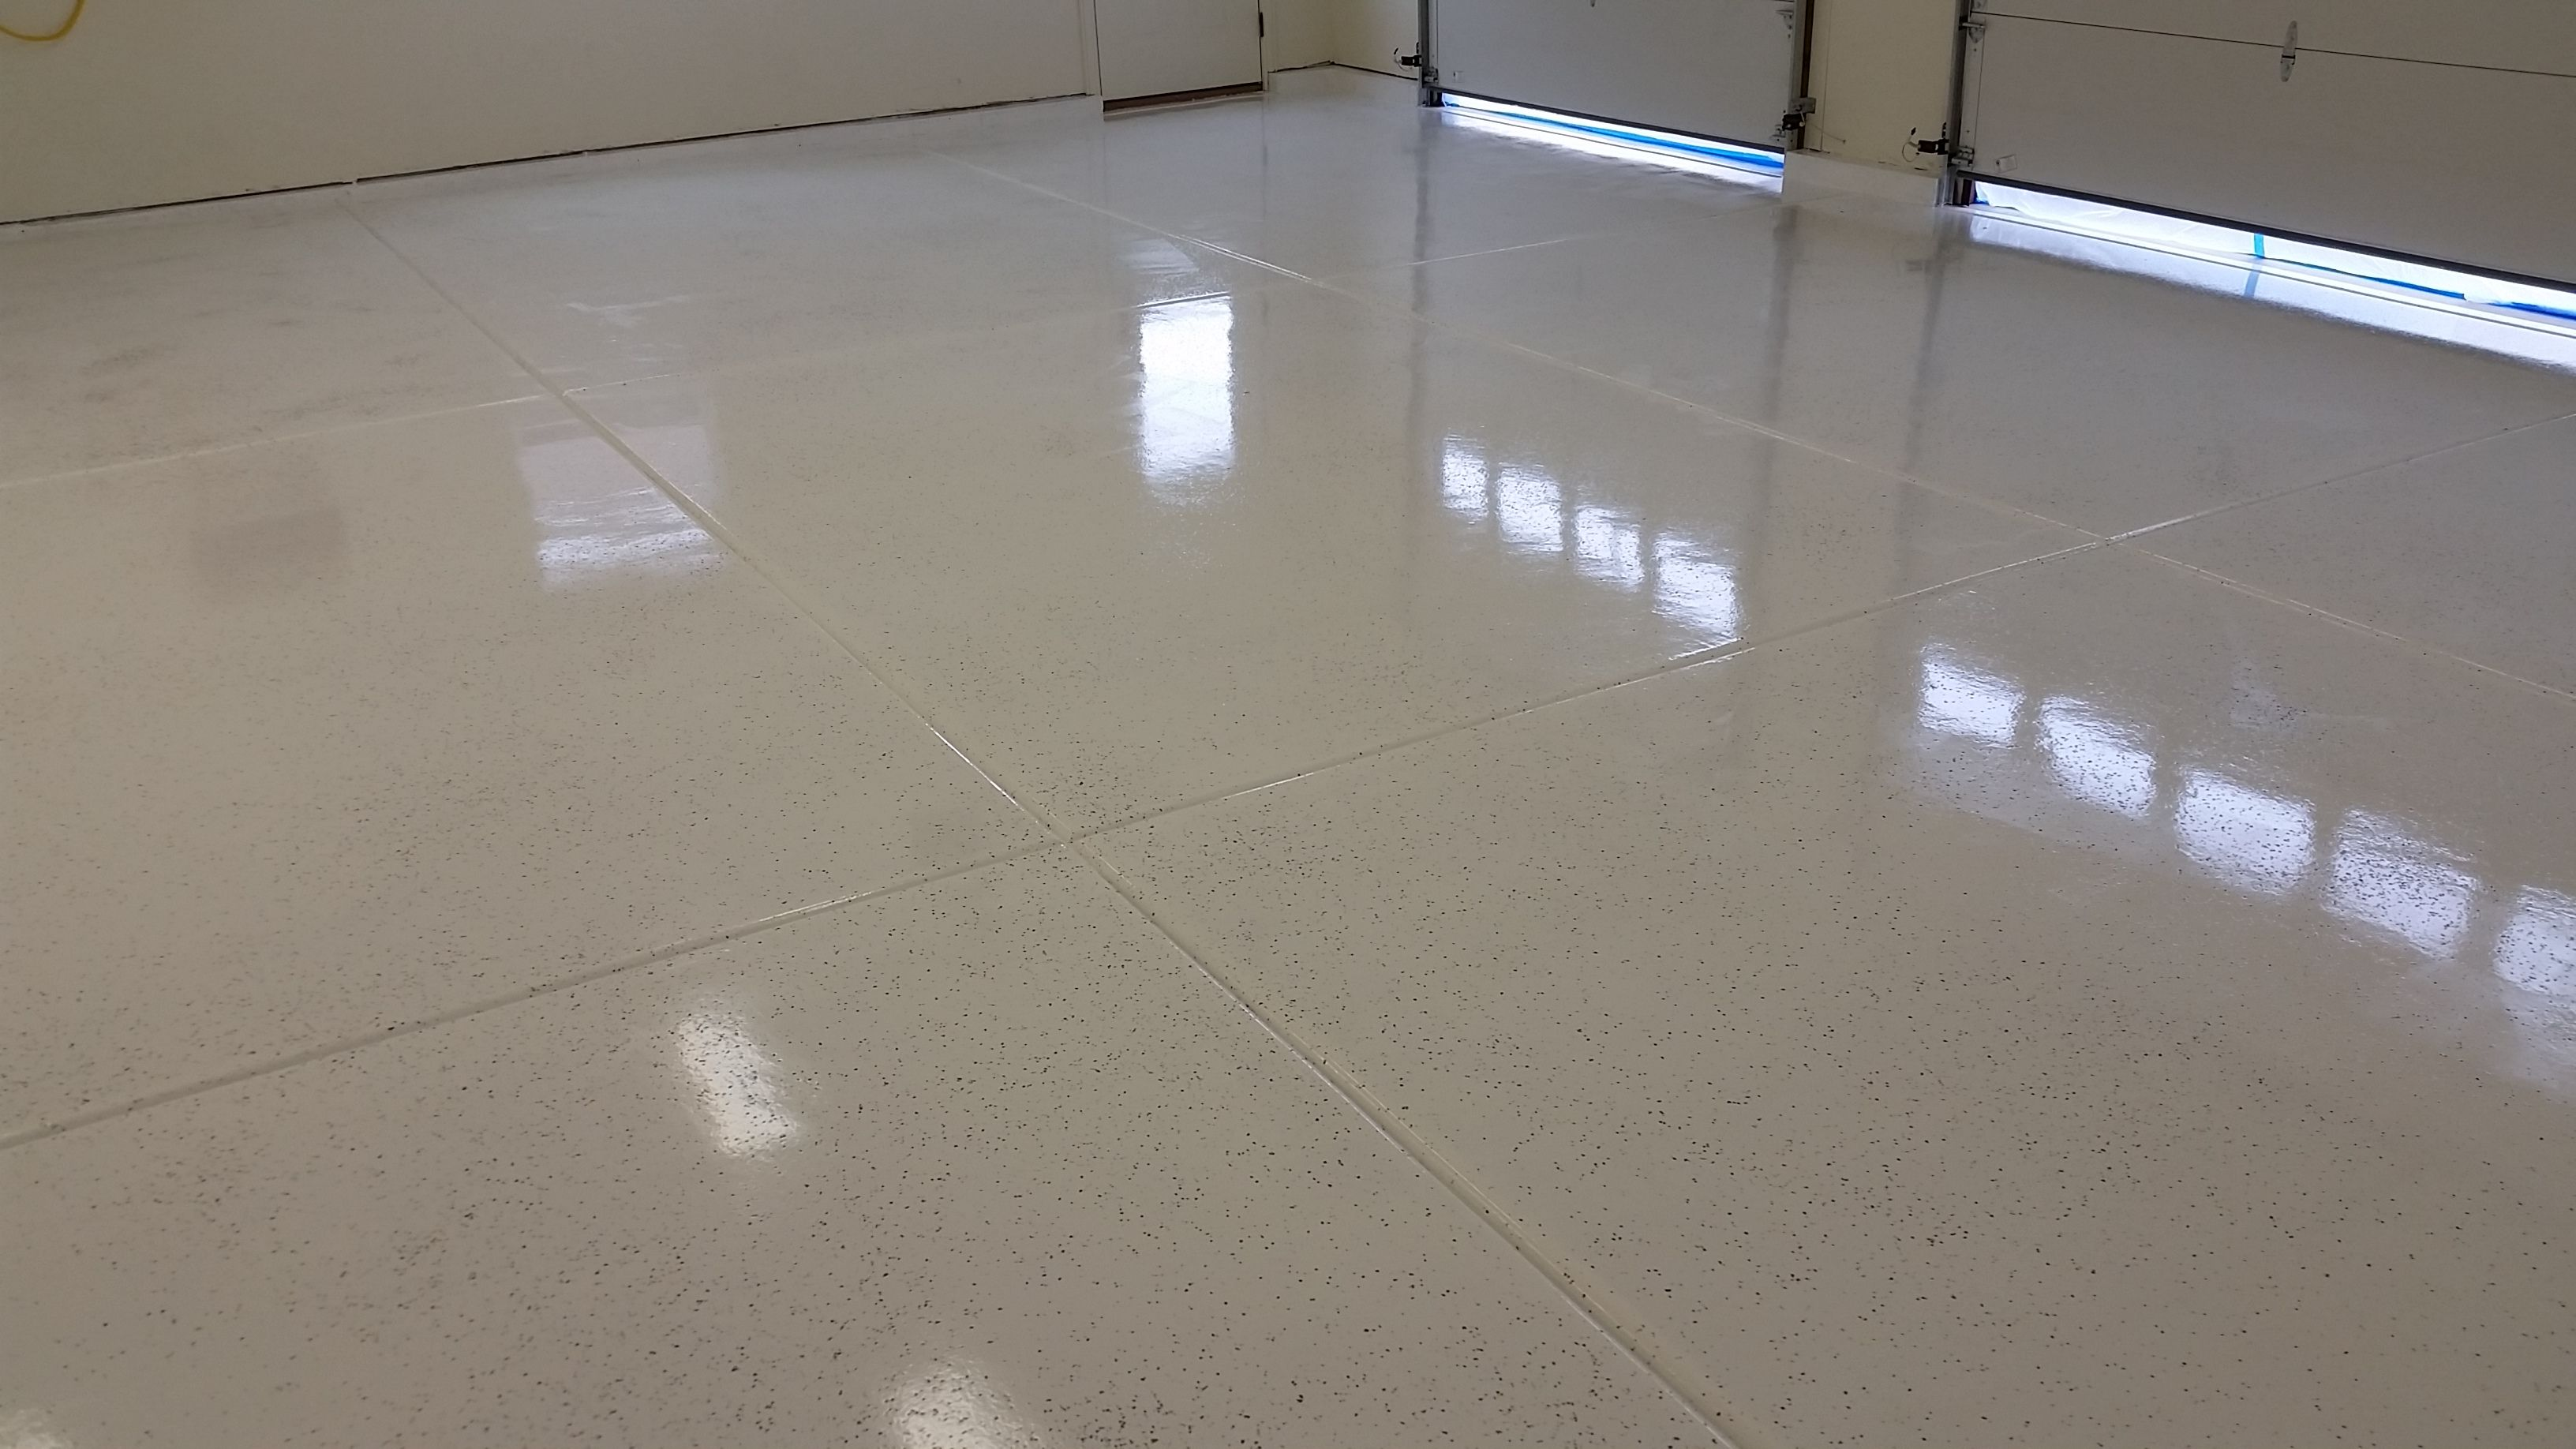 Garage Flooring Tiles Mats Rolls More Garageflooringllc Tile Floor Garage Floor Tiles Garage Floor Epoxy